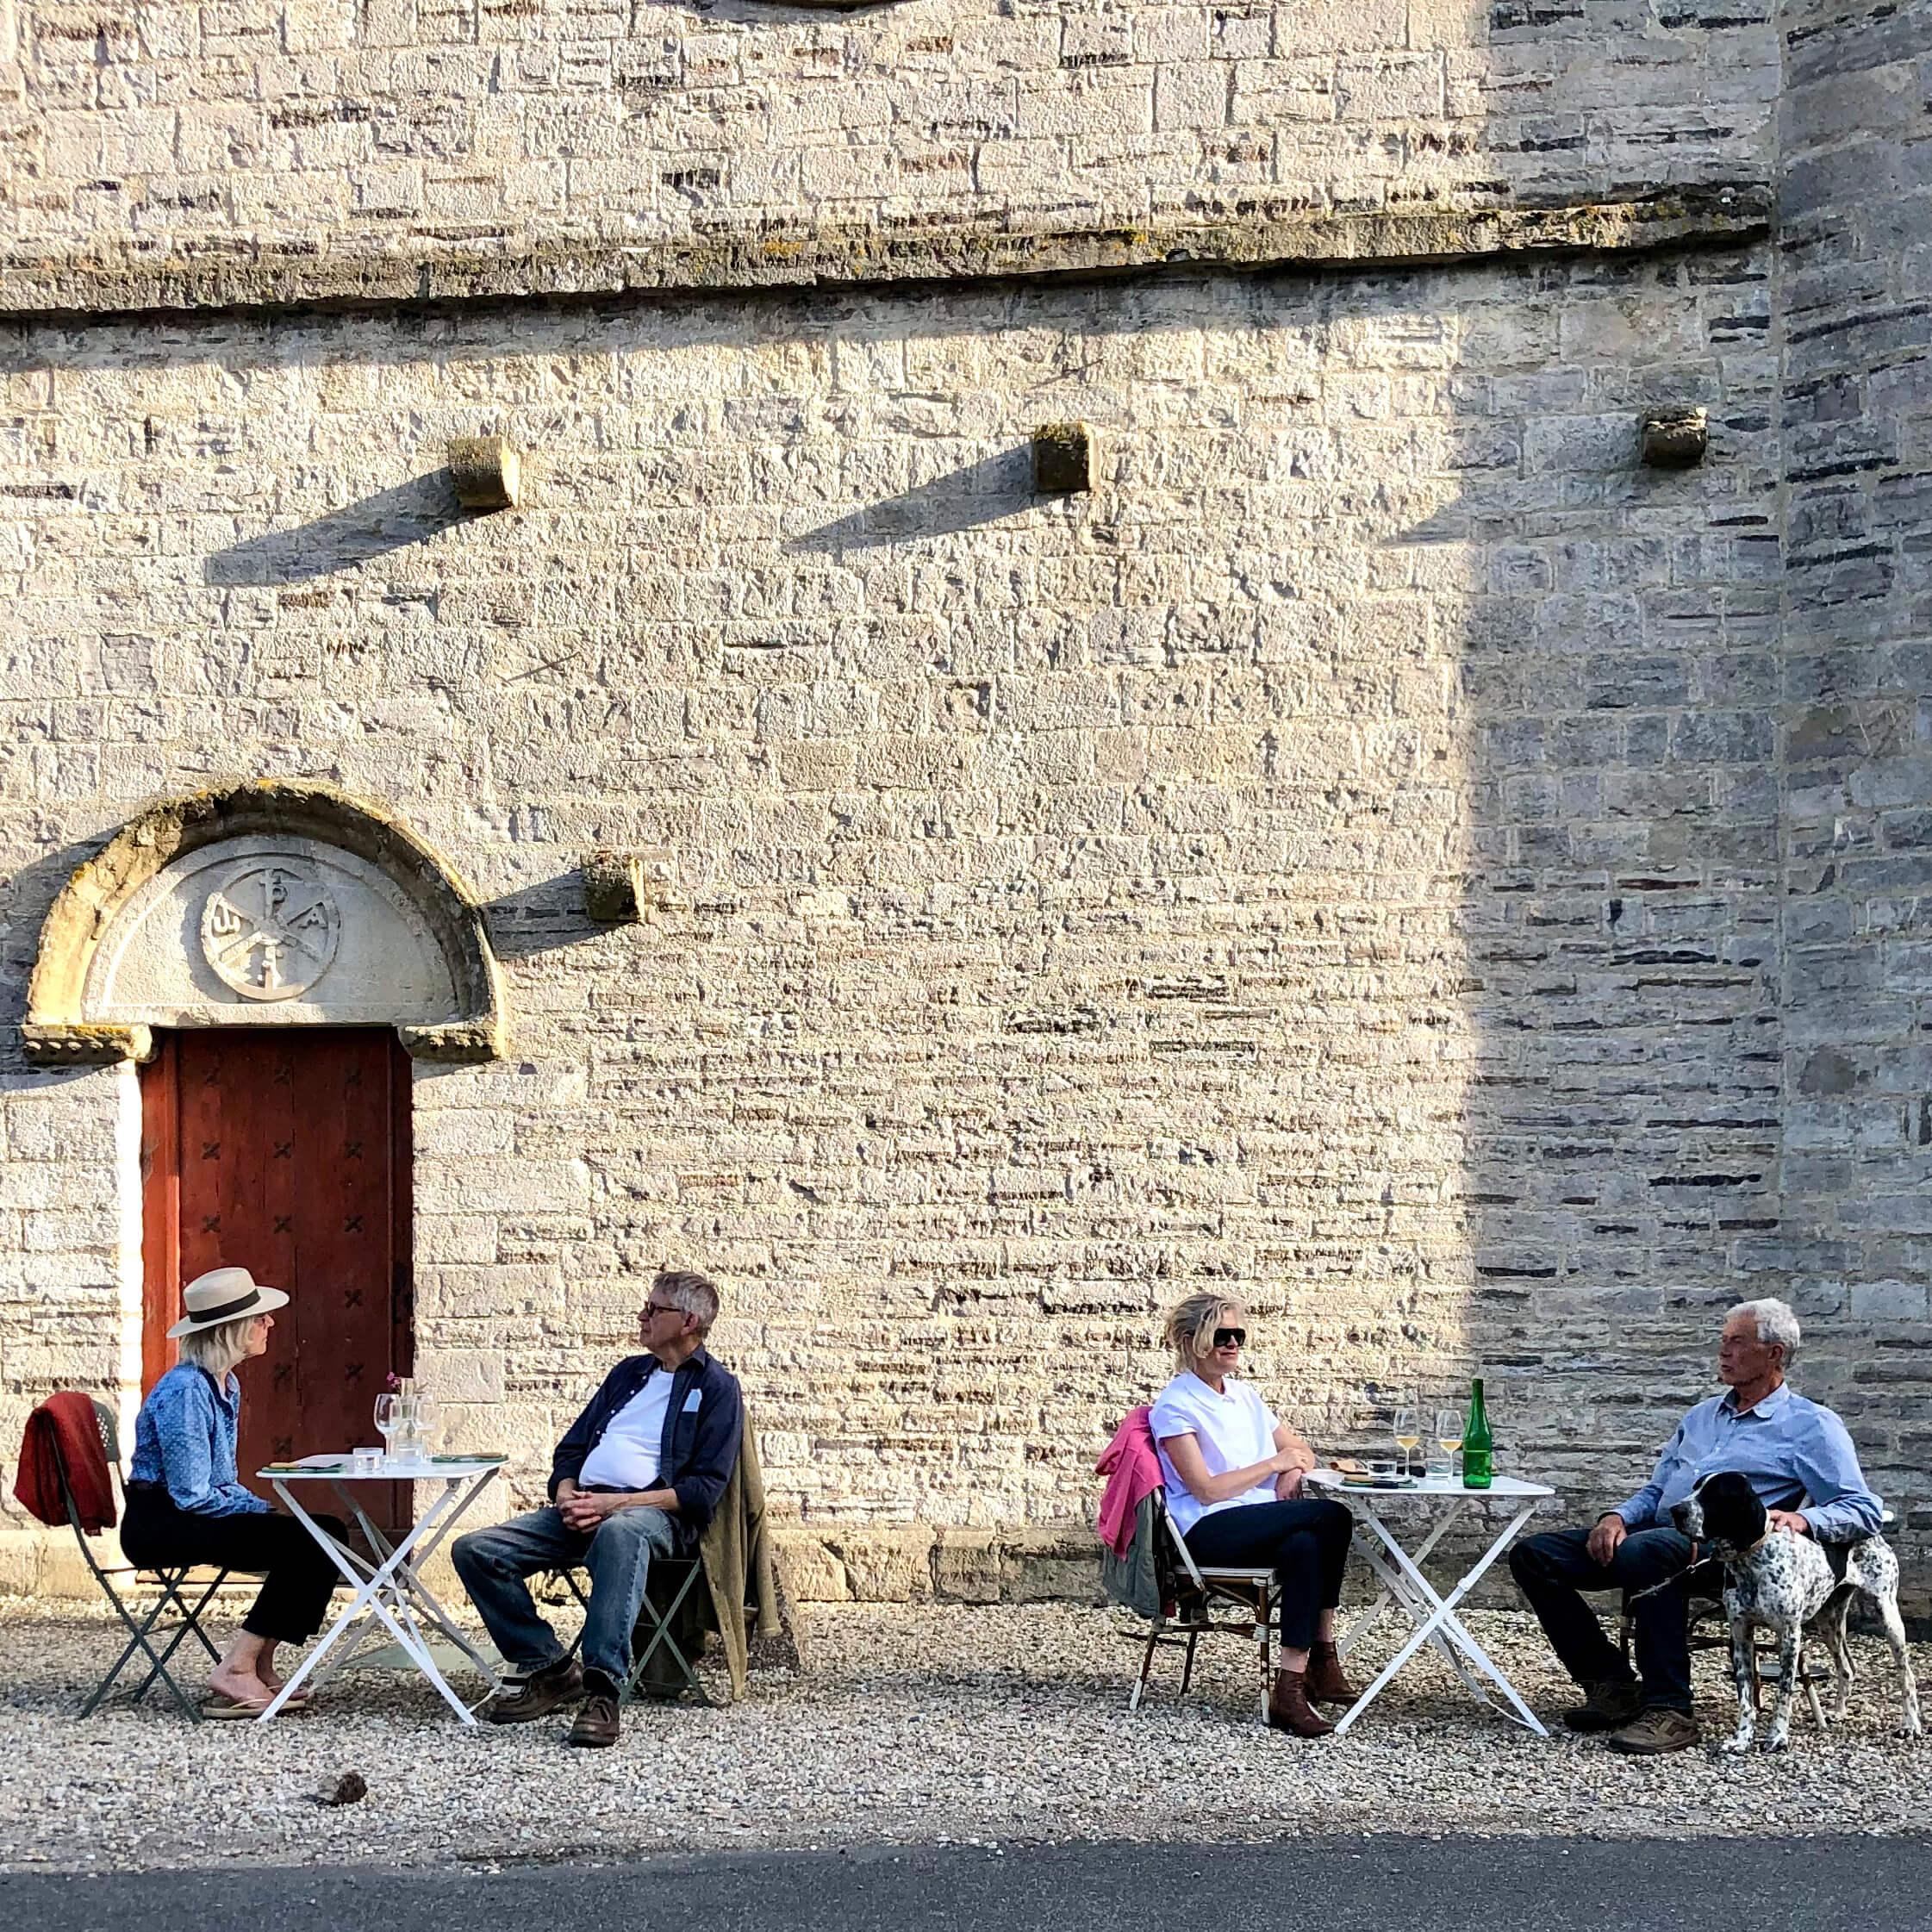 Andrein, France, a week after restaurants reopened